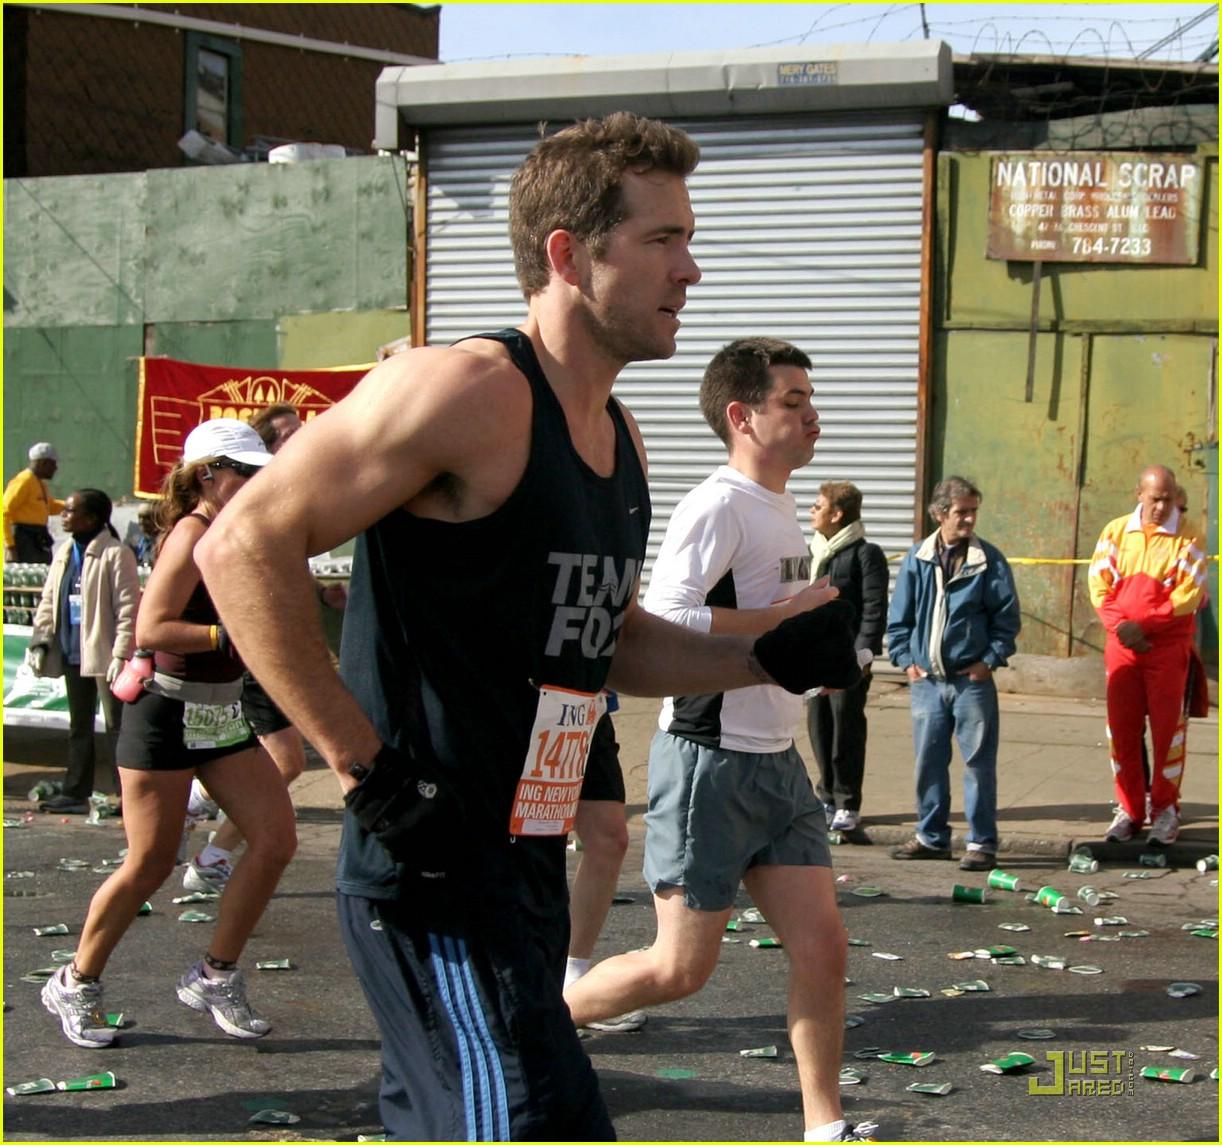 NYC marathon celebrity results - sheknows.com